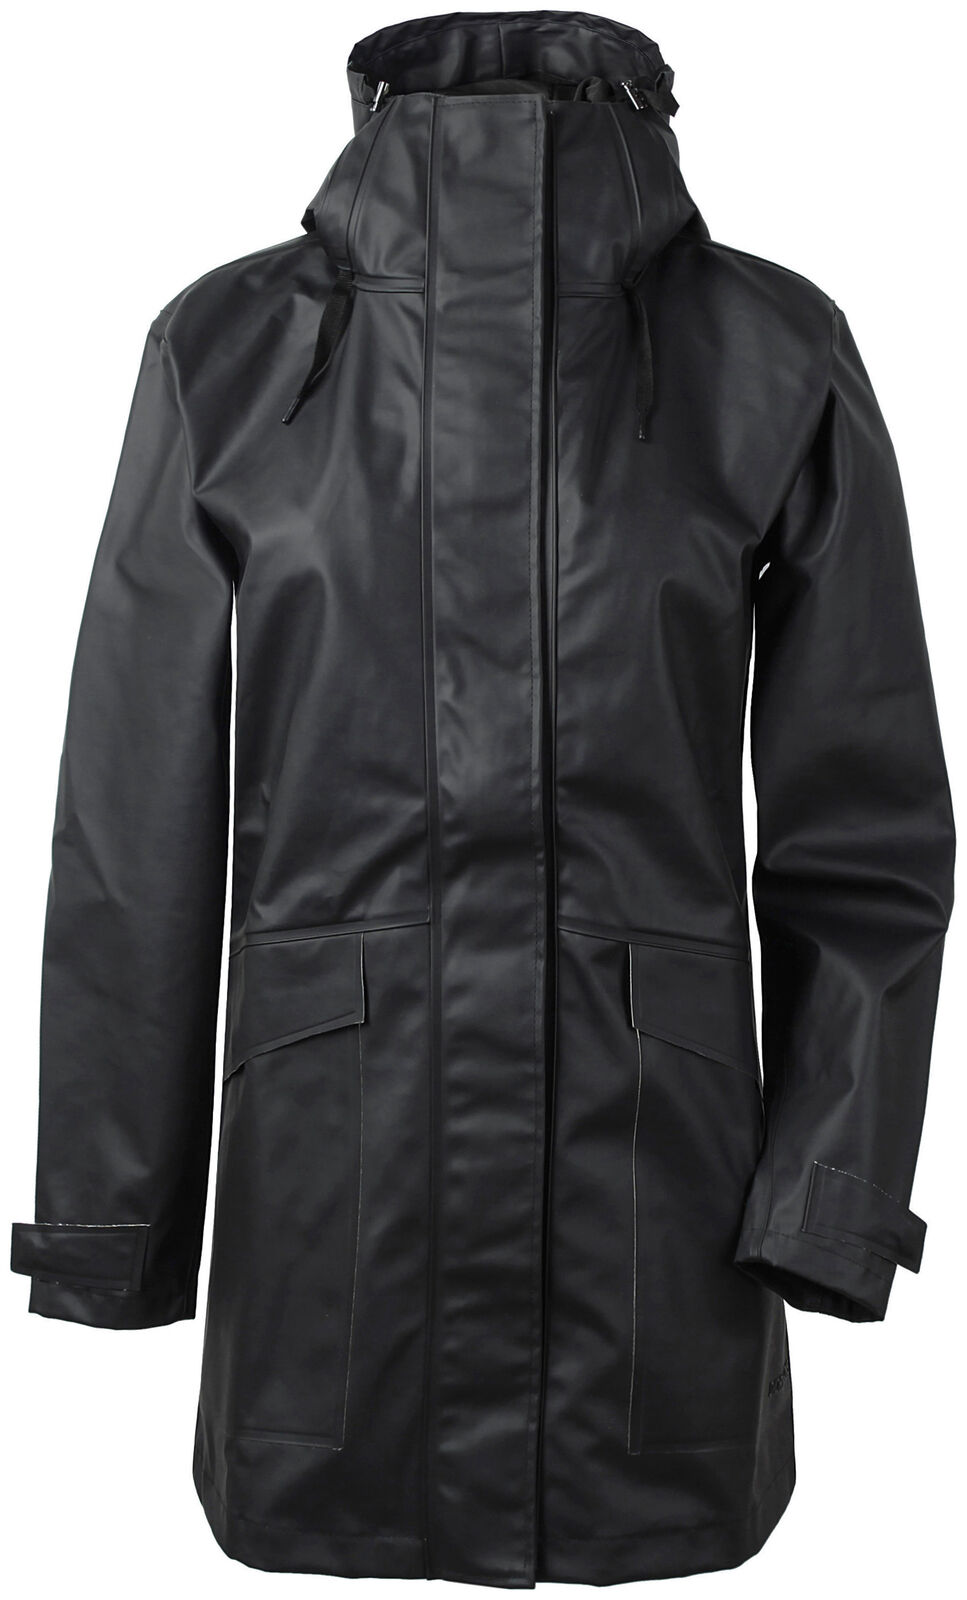 Hosen adidas ZNE Striker Pant BS4871 L Grau | eBay